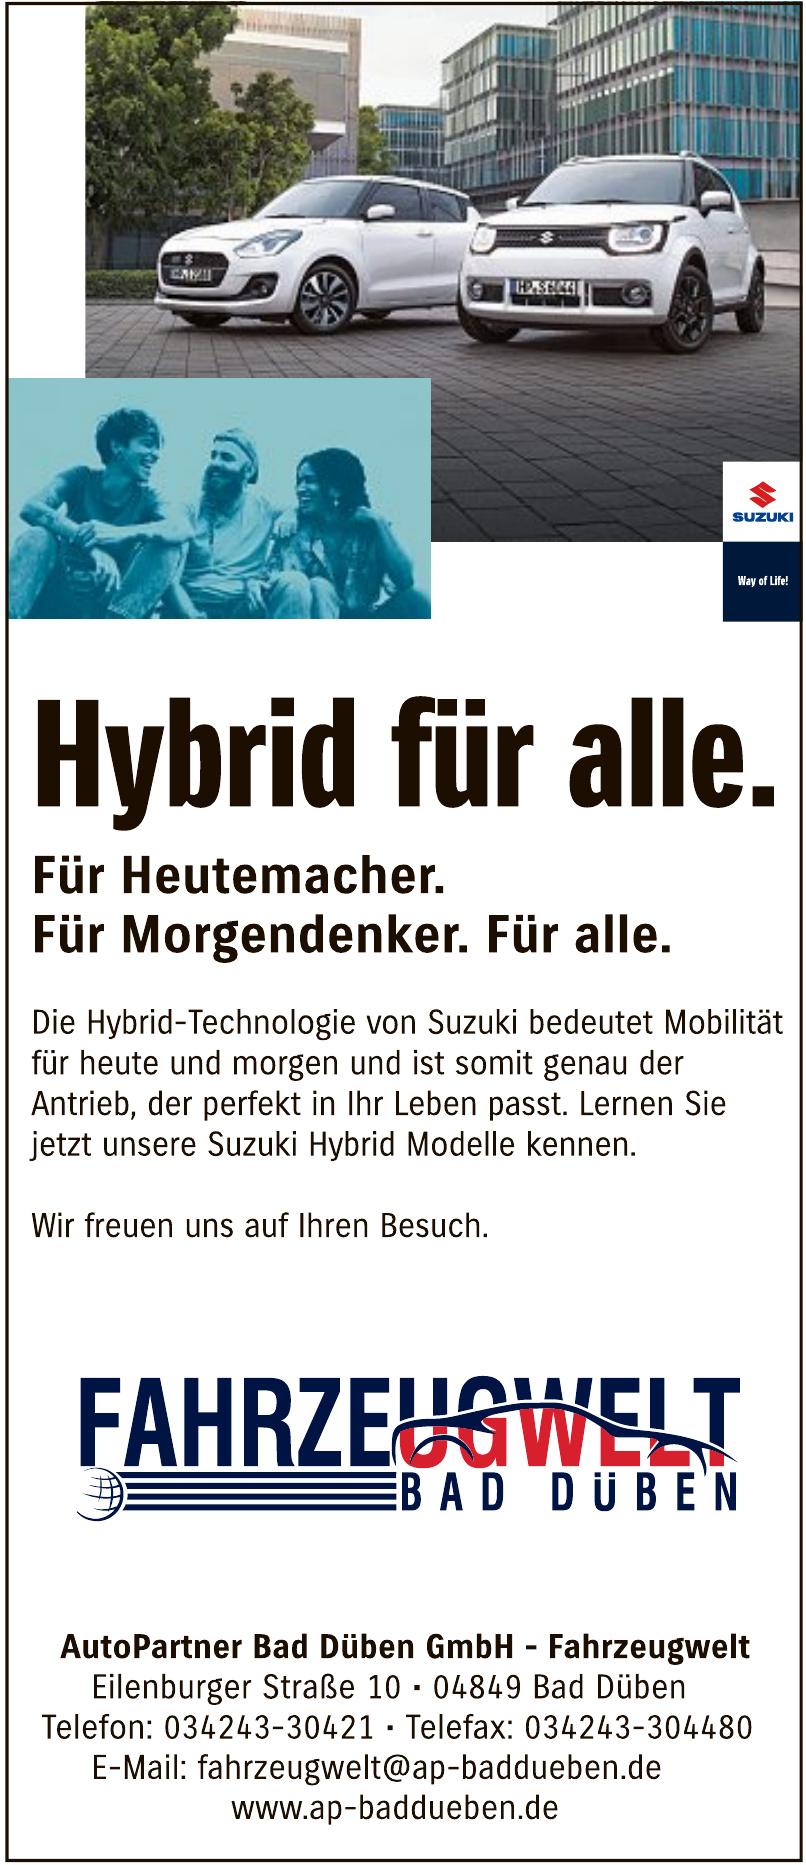 AutoPartner Bad Düben GmbH